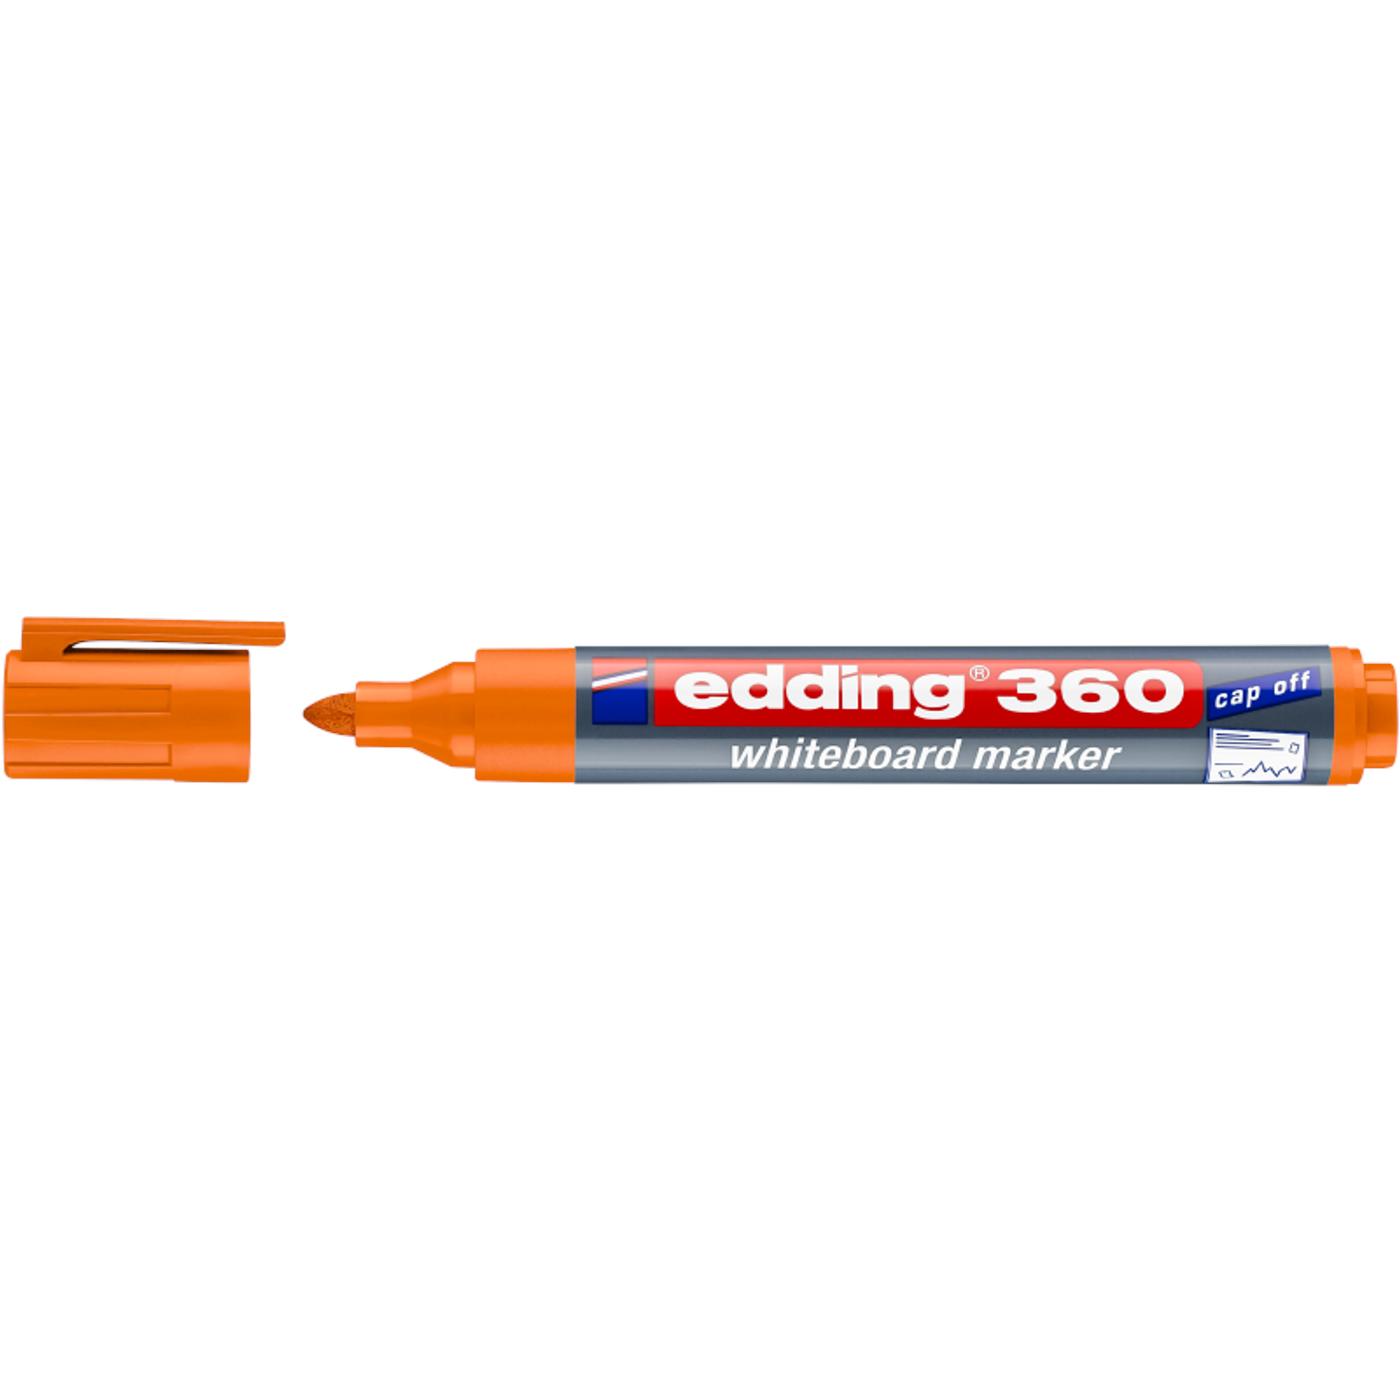 EDDING 360 WHITEBOARD MARKER (ORANGE)